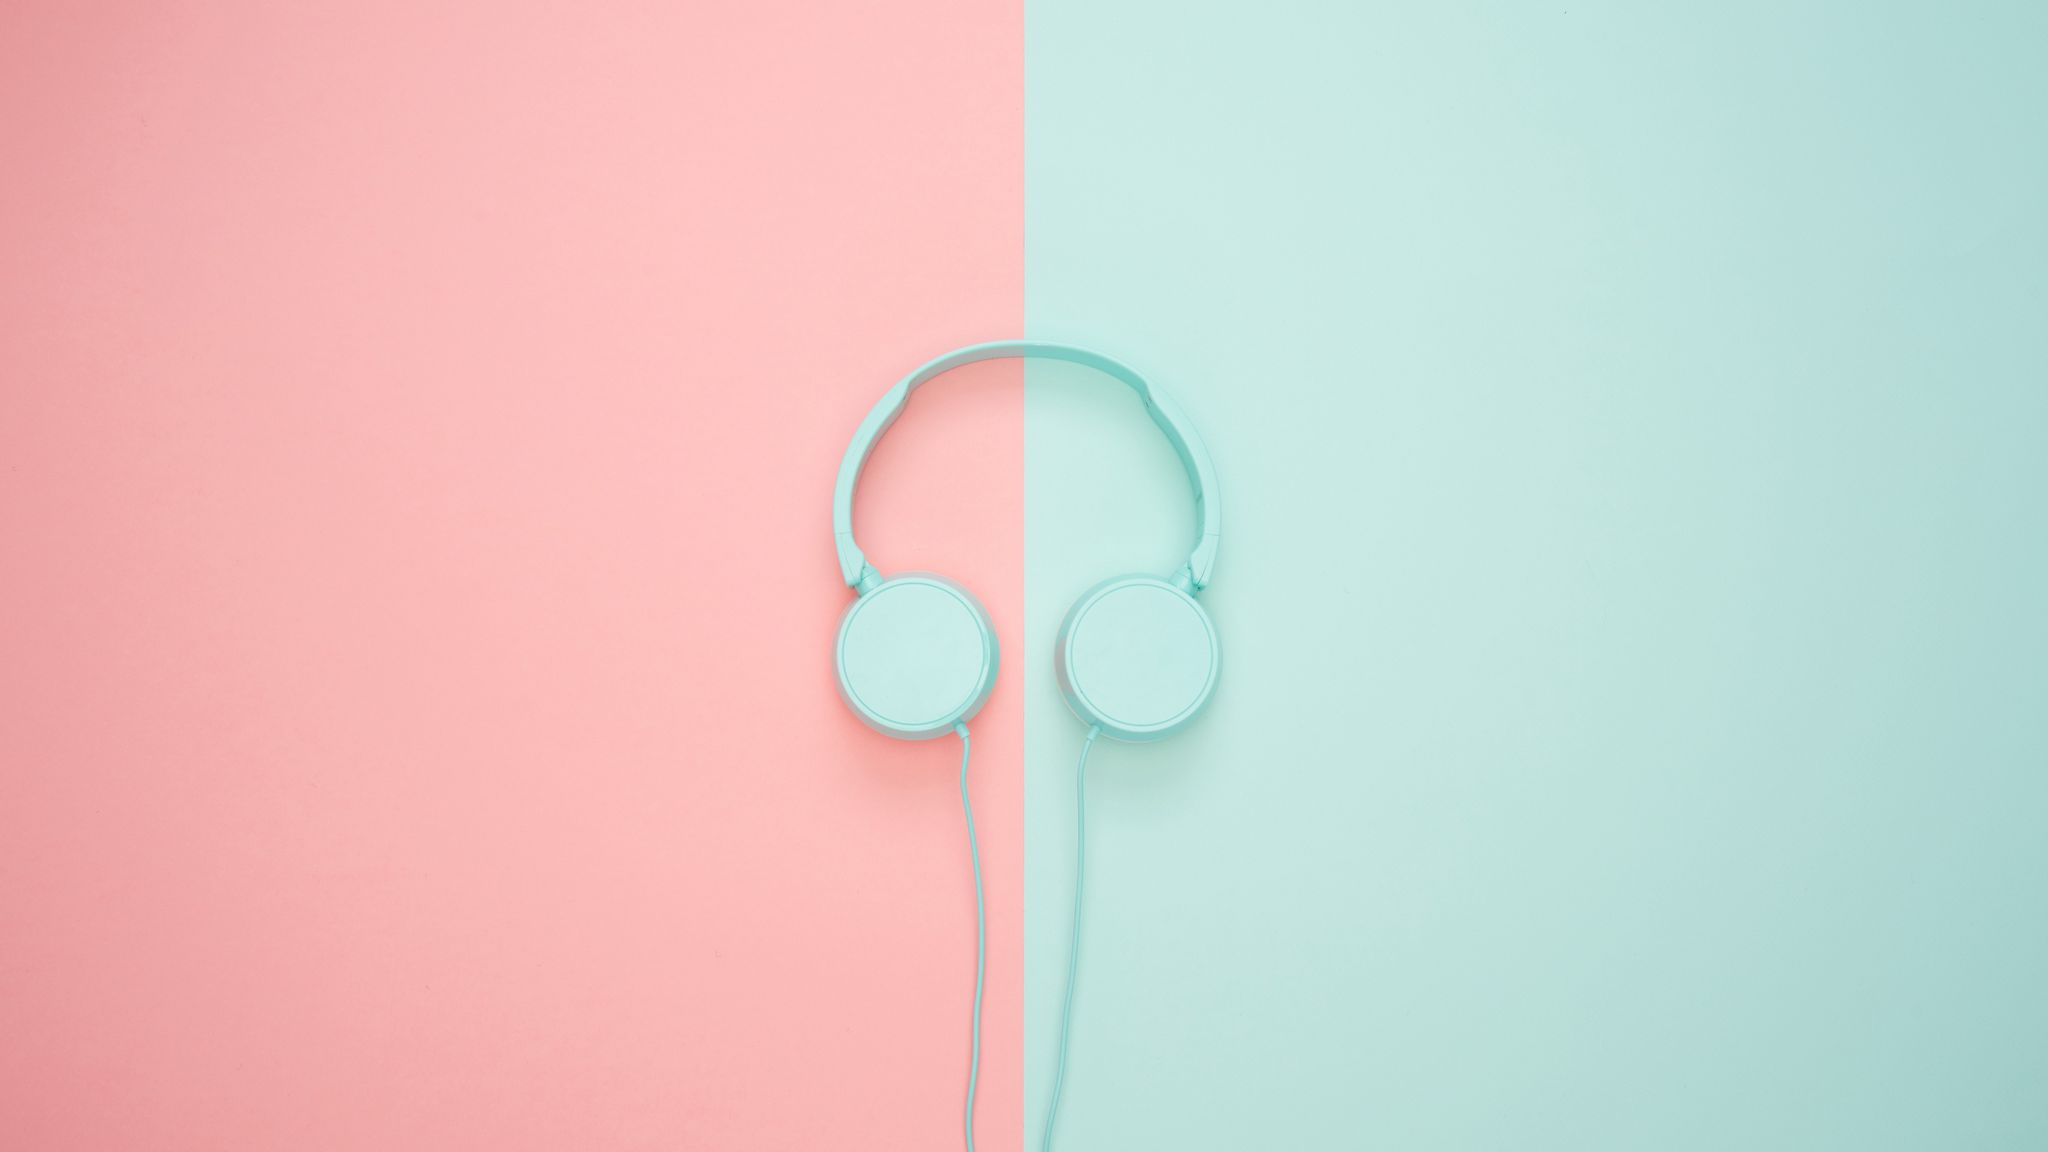 2048x1152 Wallpaper headphones, minimalism, pastel, pink